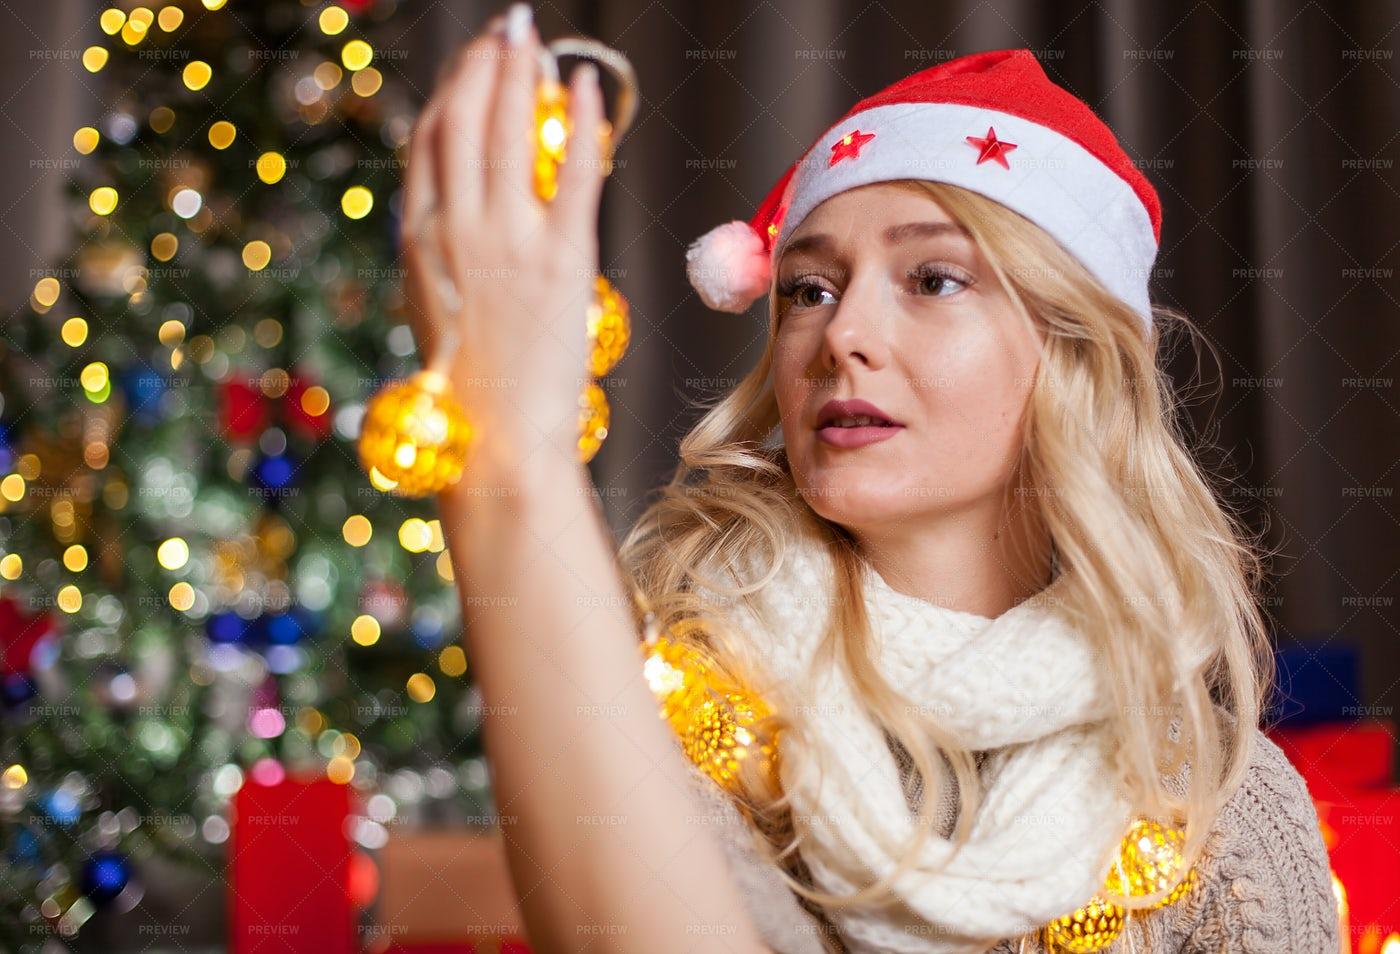 Christmas Decorations: Stock Photos